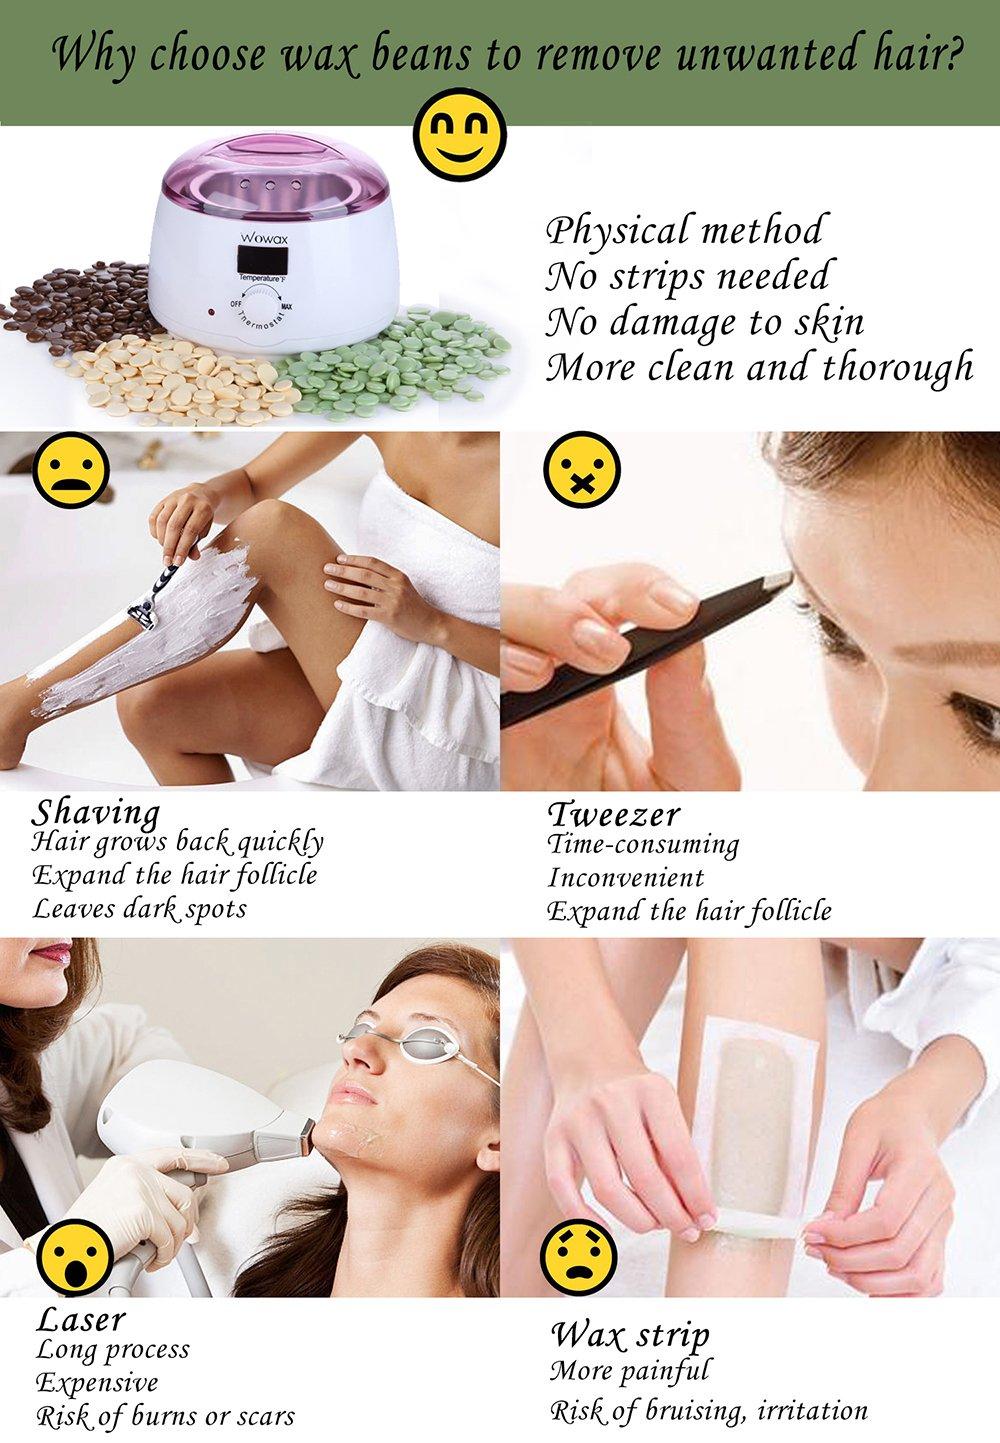 Wowax Wax Warmer Hair Removal Wax Heater With 14oz Wax Melting Pot